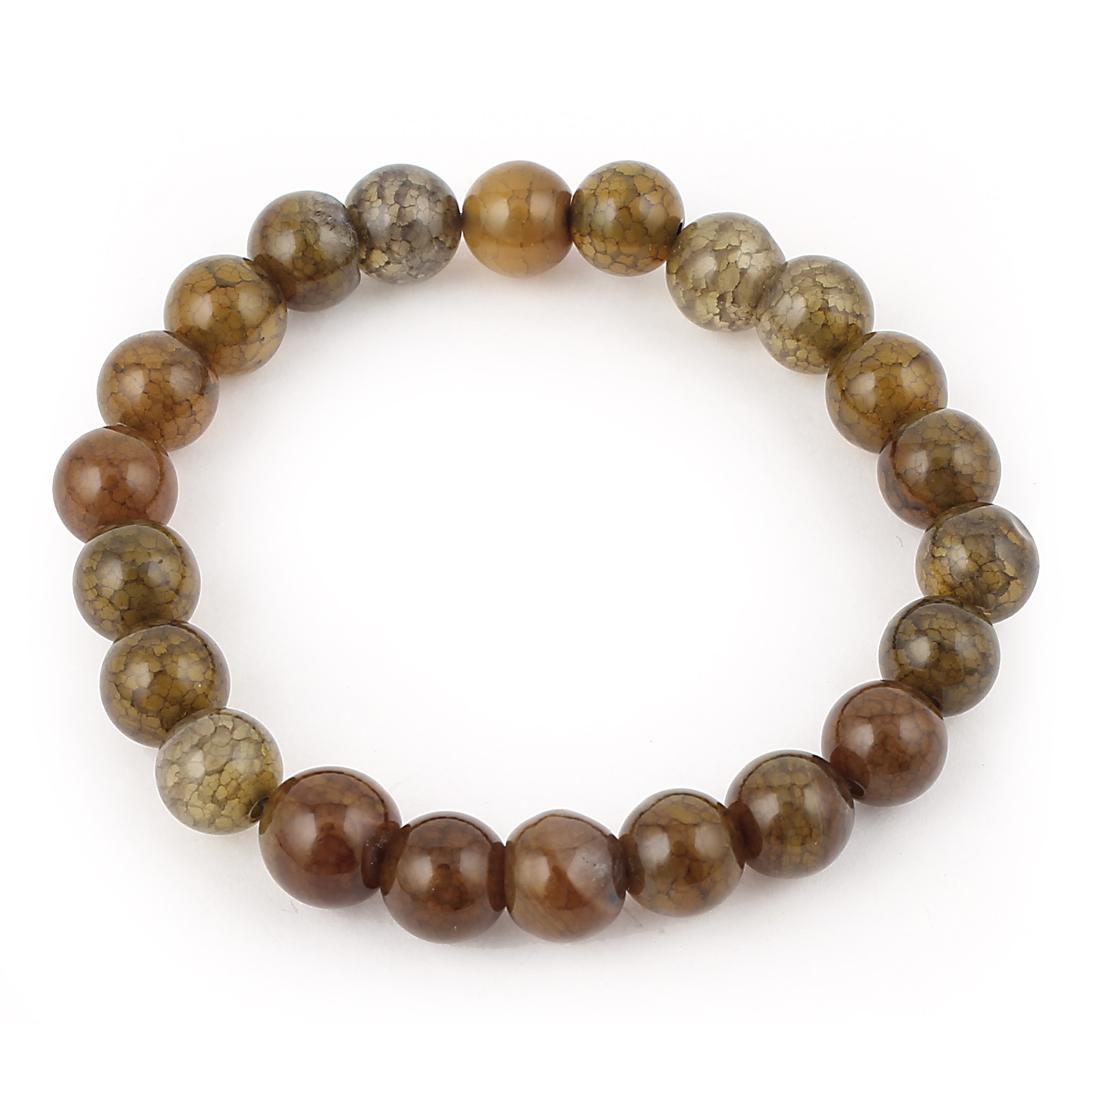 Lady Jewelry Round Faux Jade Beads Decor Elastic Wrist Bangle Bracelet Brown